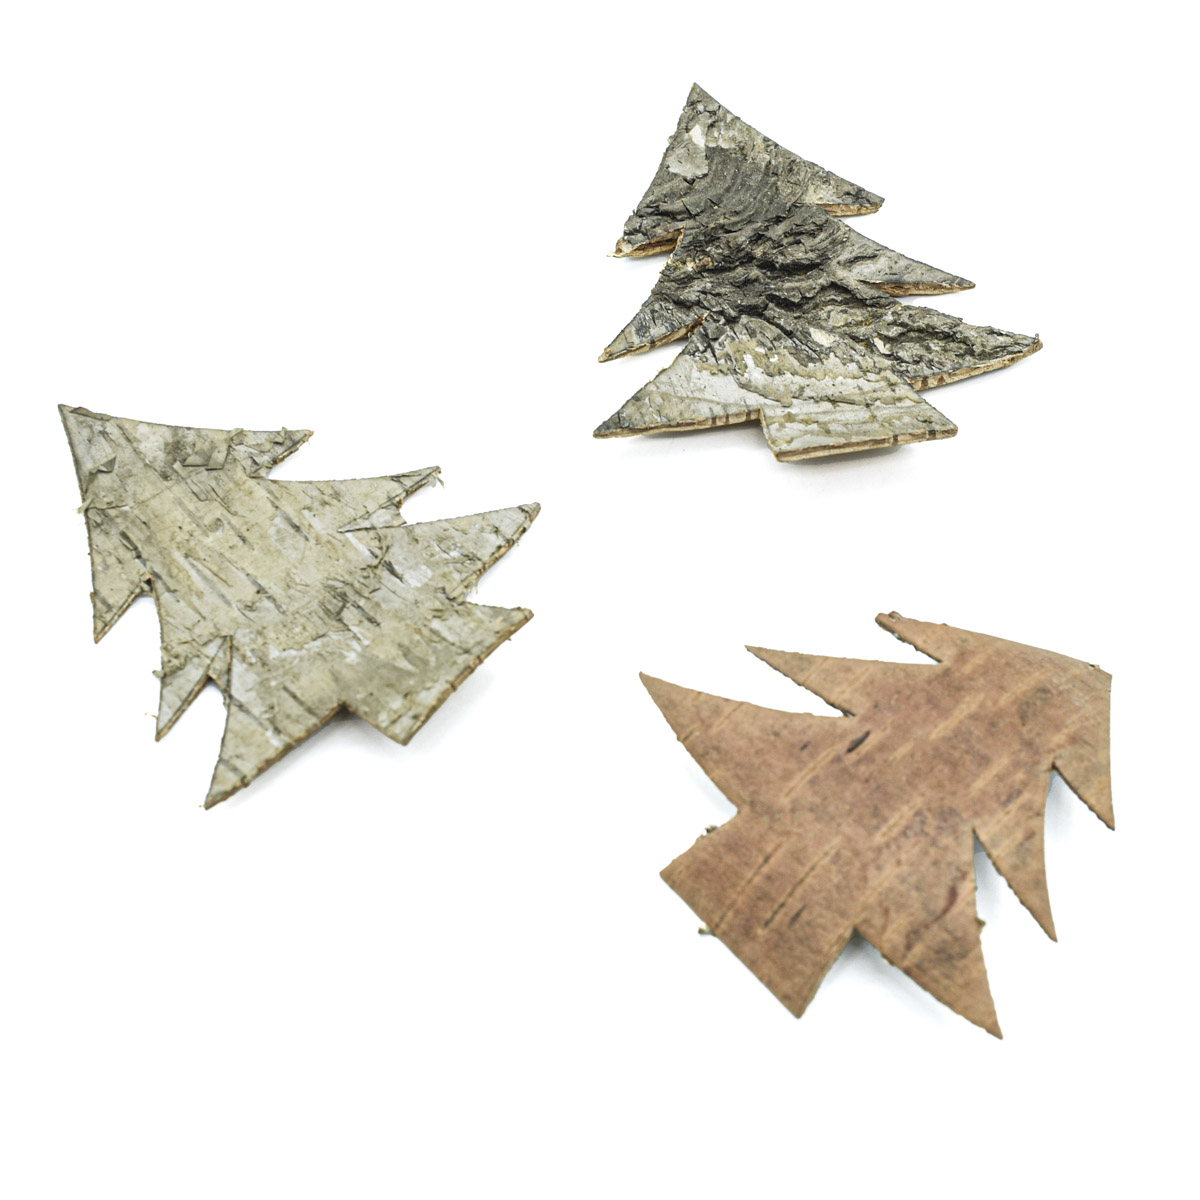 YW021 Декоративные элементы из коры дерева 'Елочки',